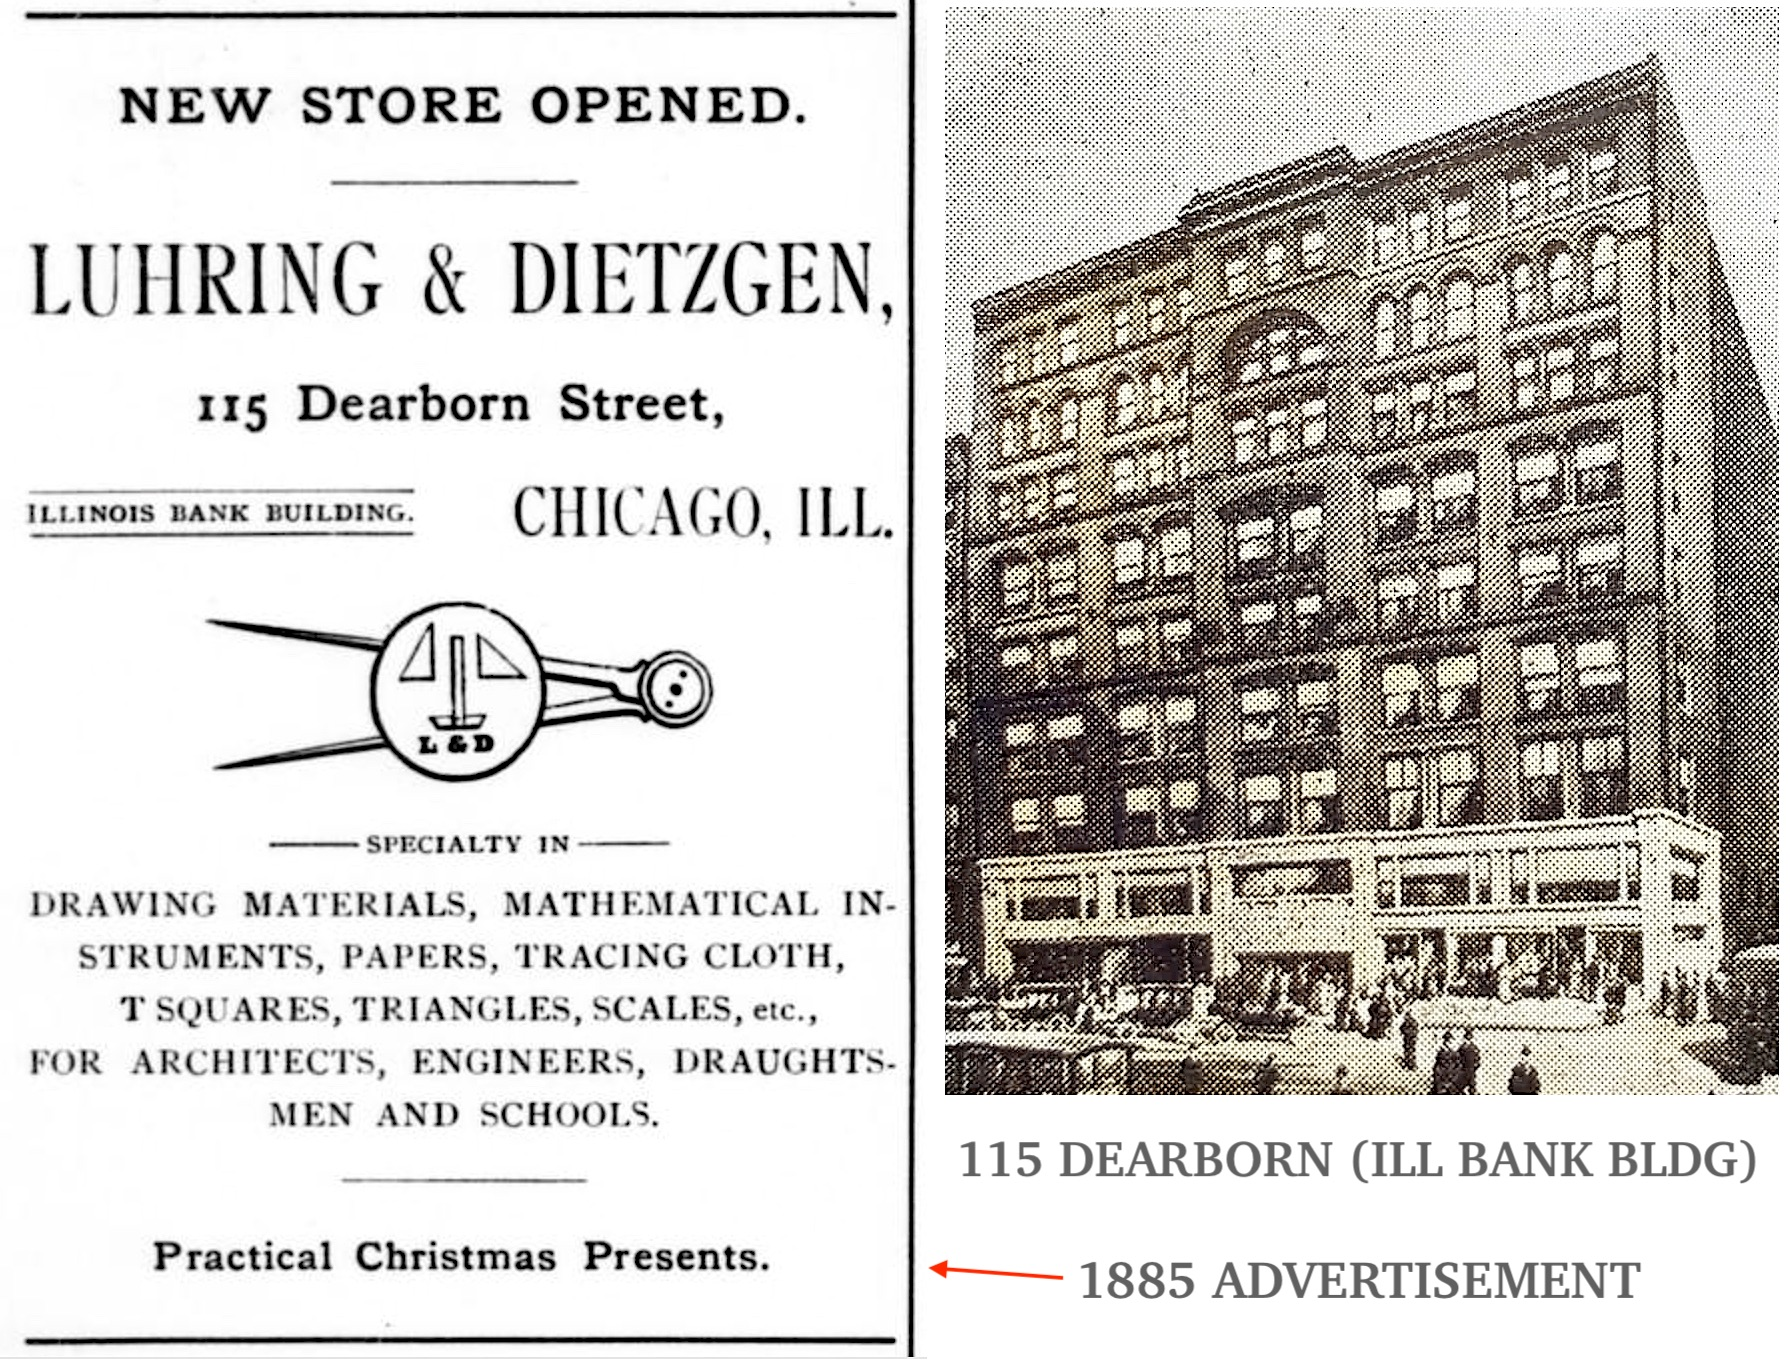 Luhring & Dietzgen 1885